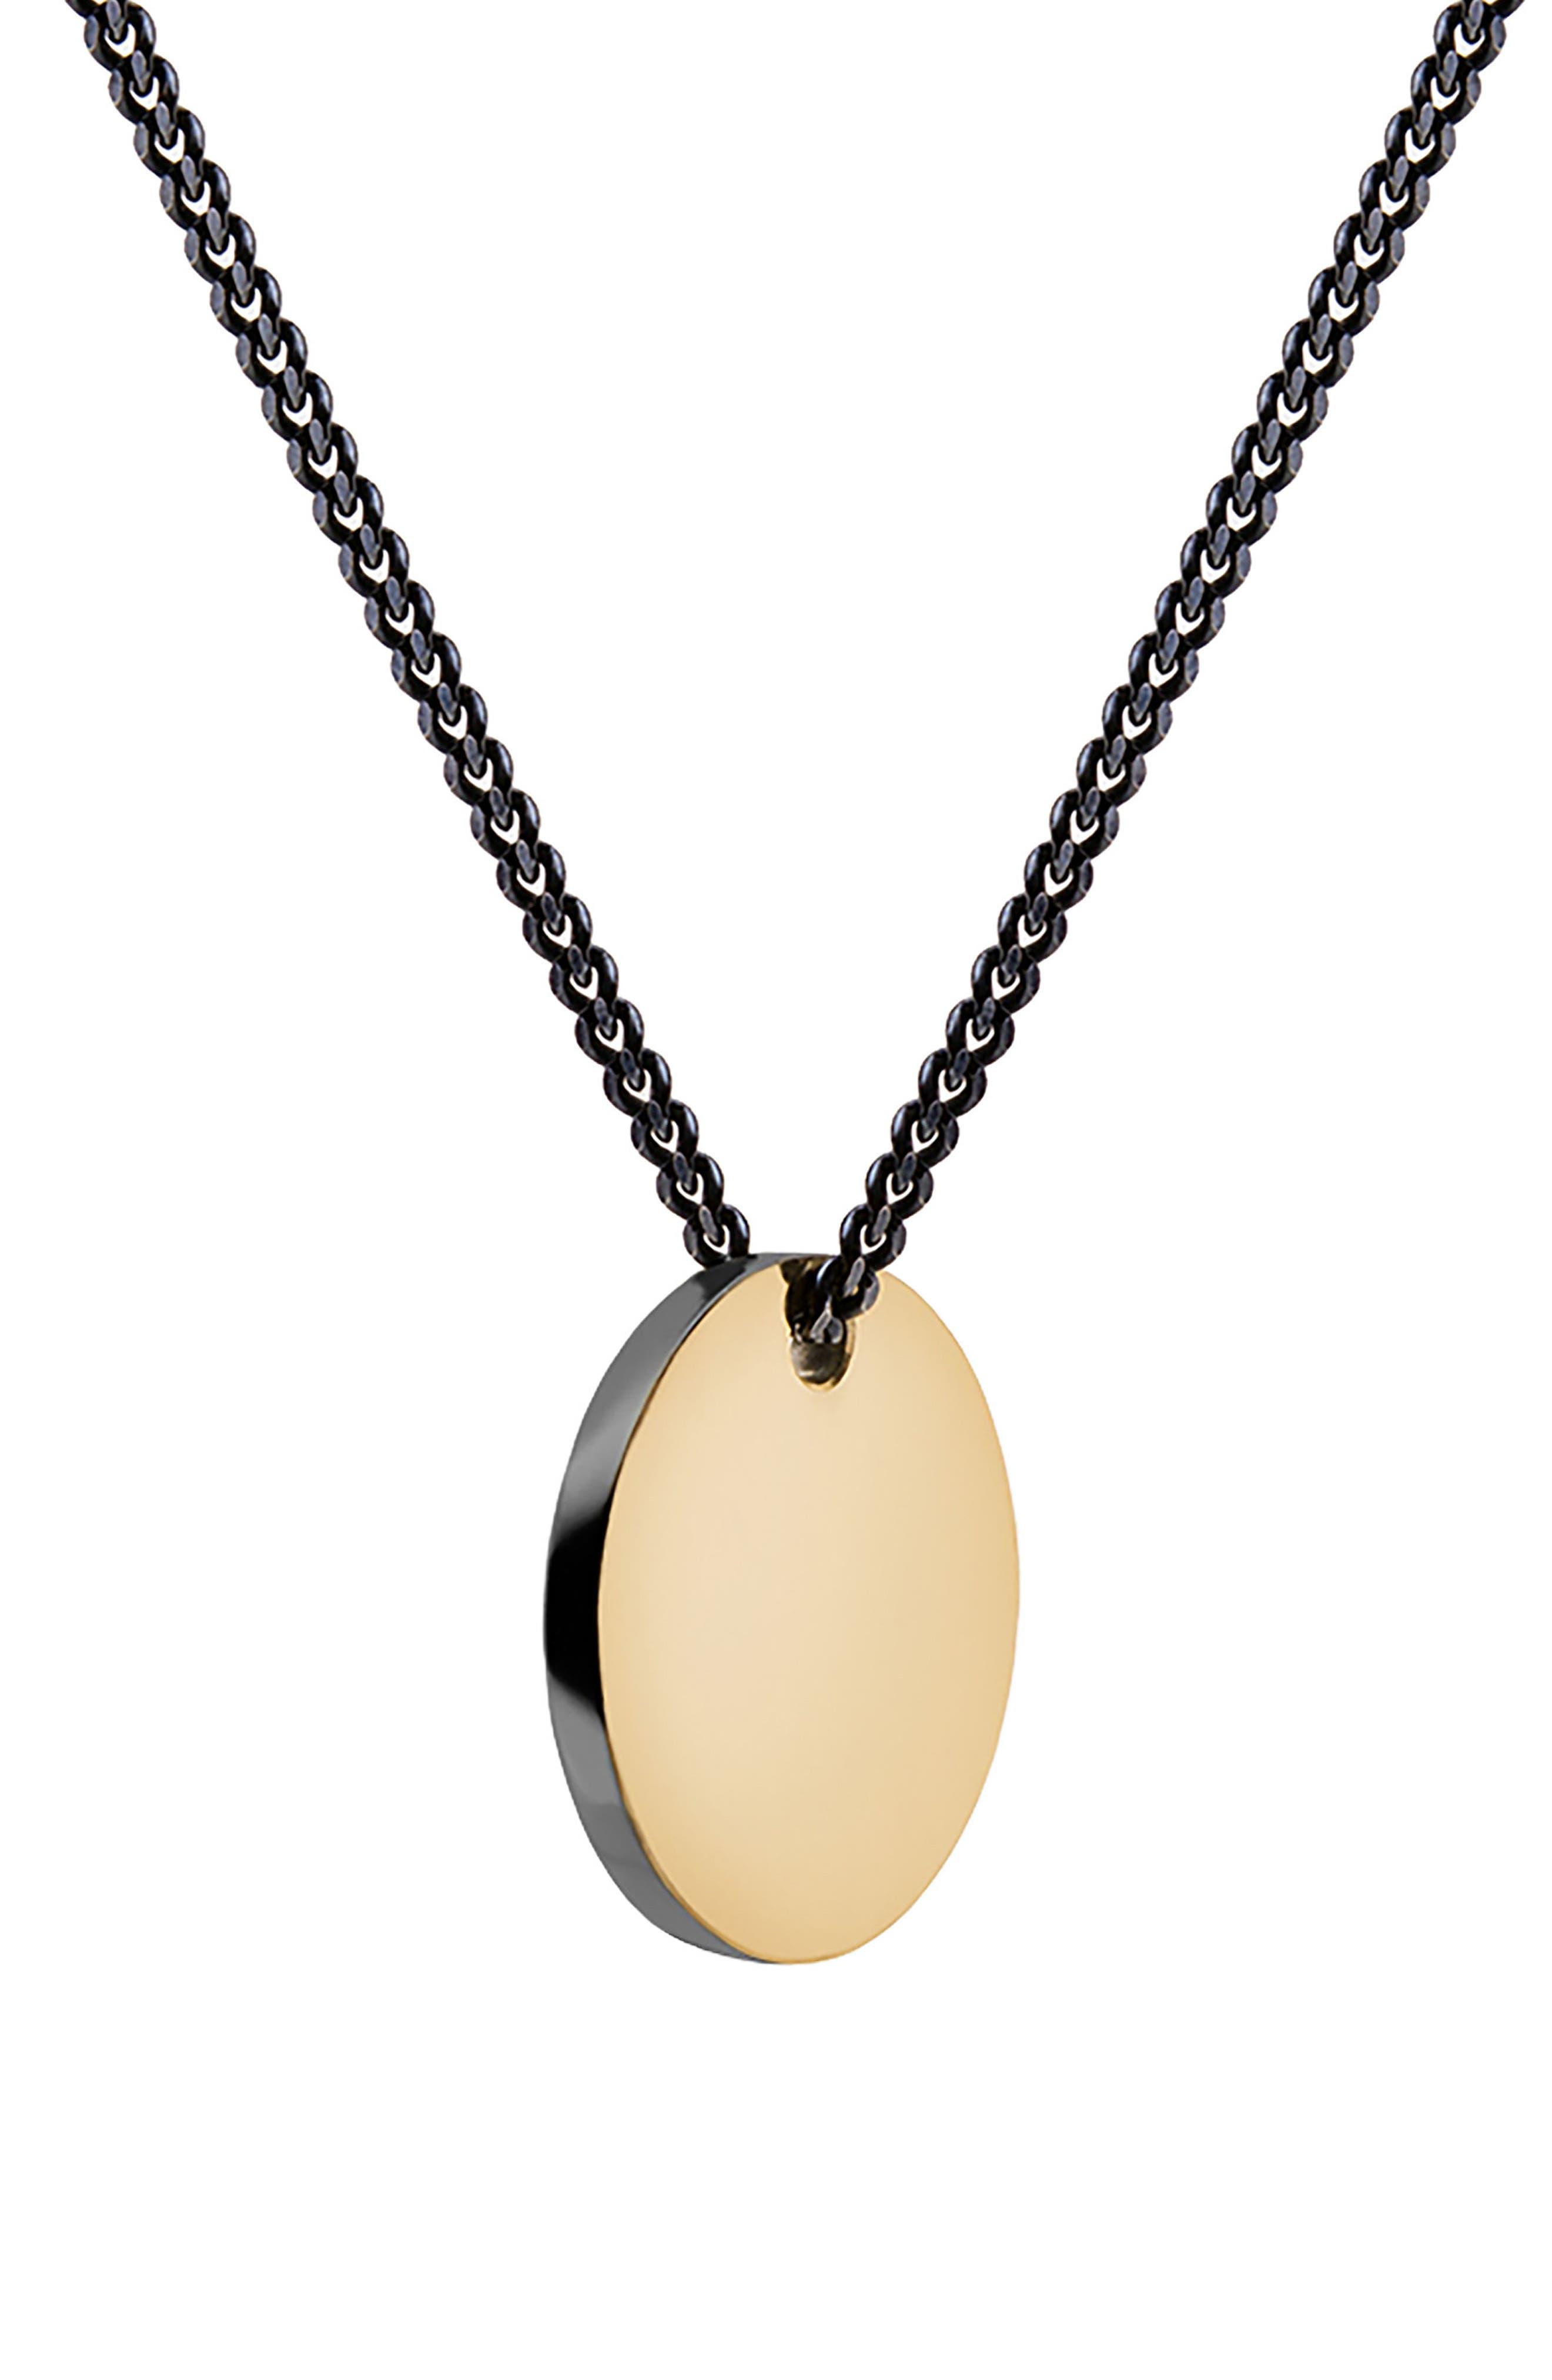 Fusion Pendant Necklace,                         Main,                         color, Polished Gold/ Black